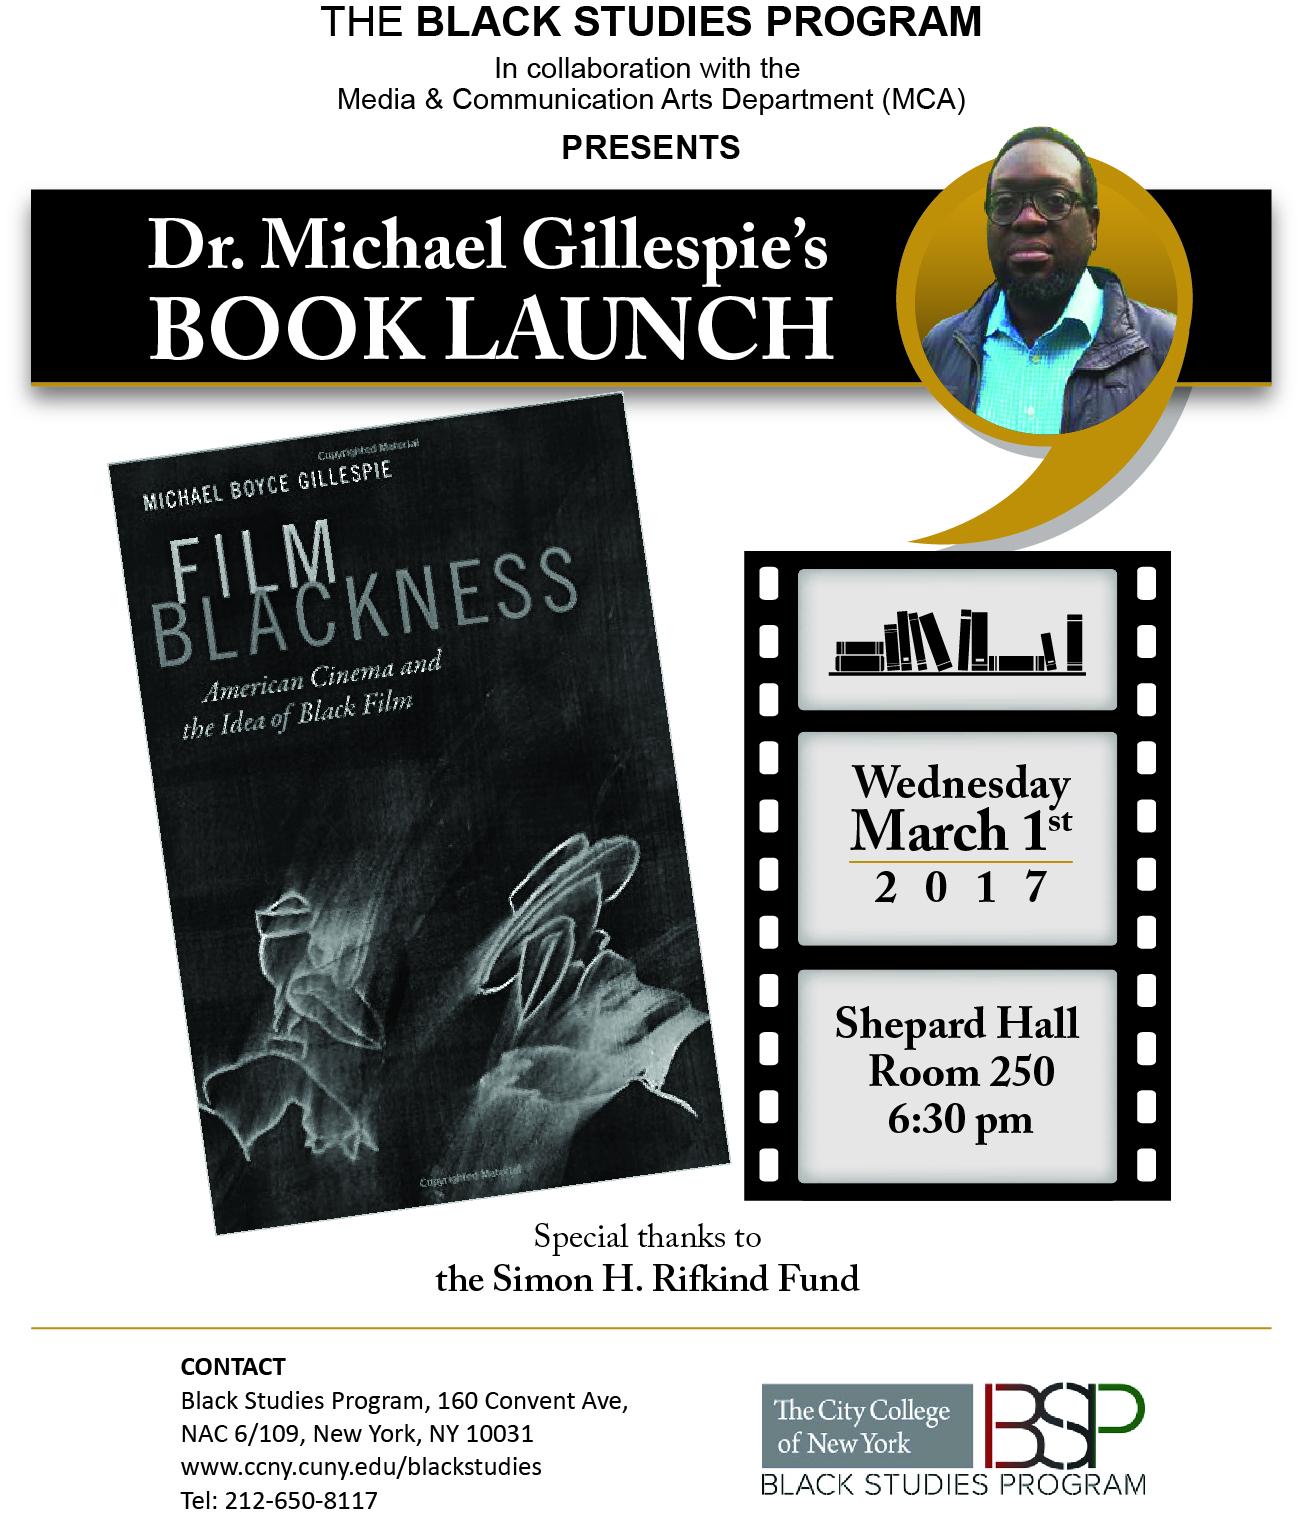 Gillespie - Film Blackness